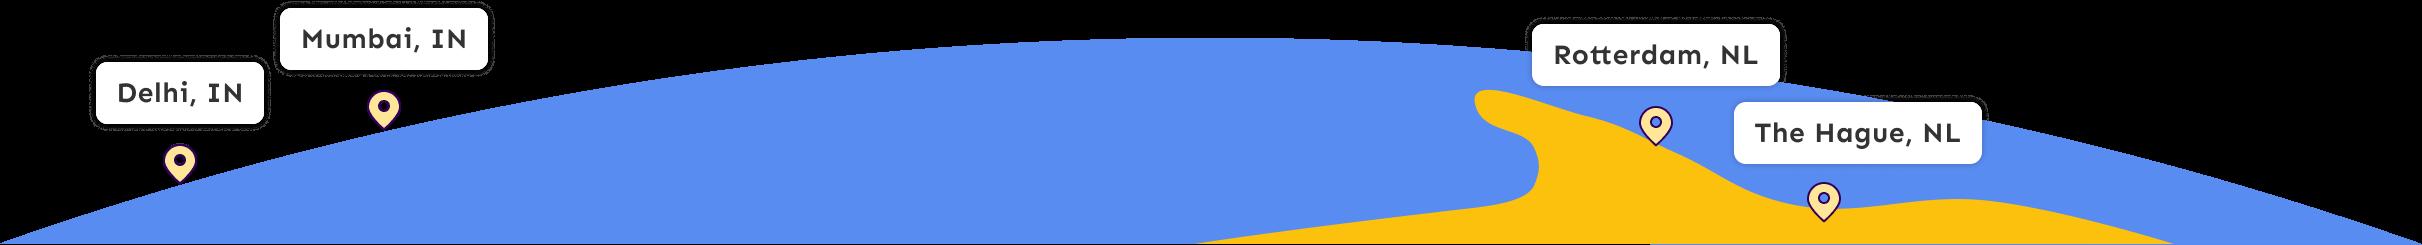 Cogoport world map